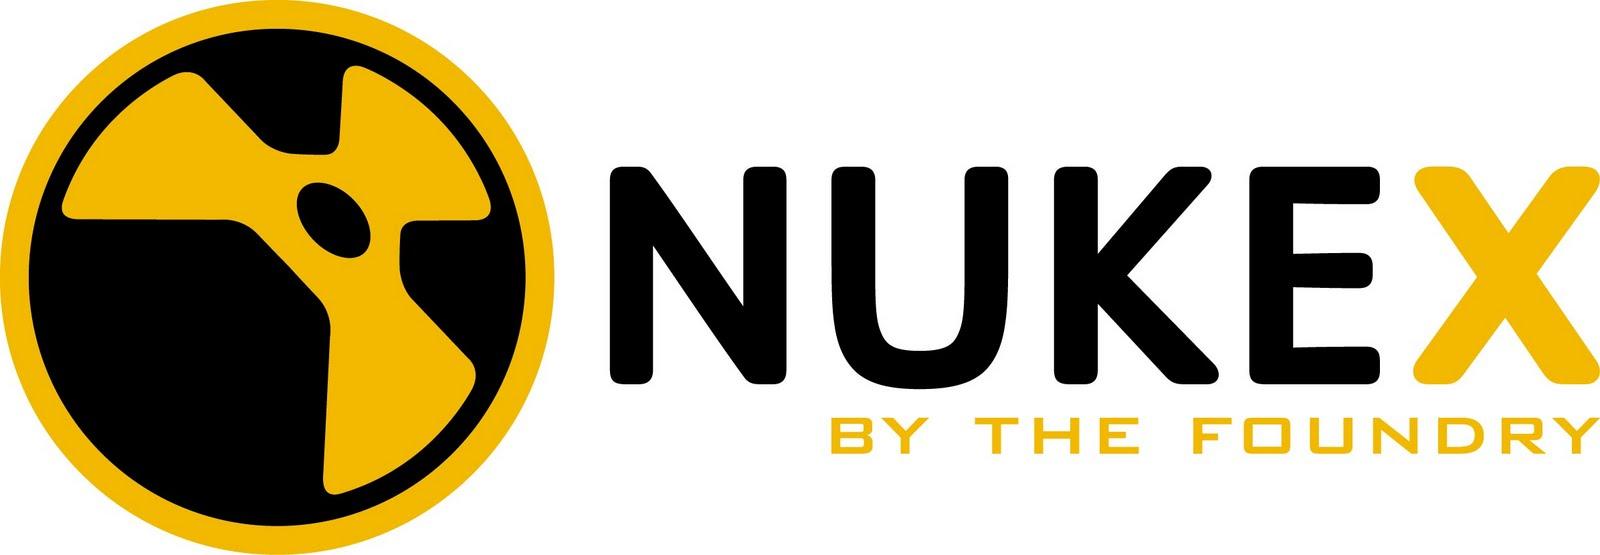 Nuke - Intermédiaire